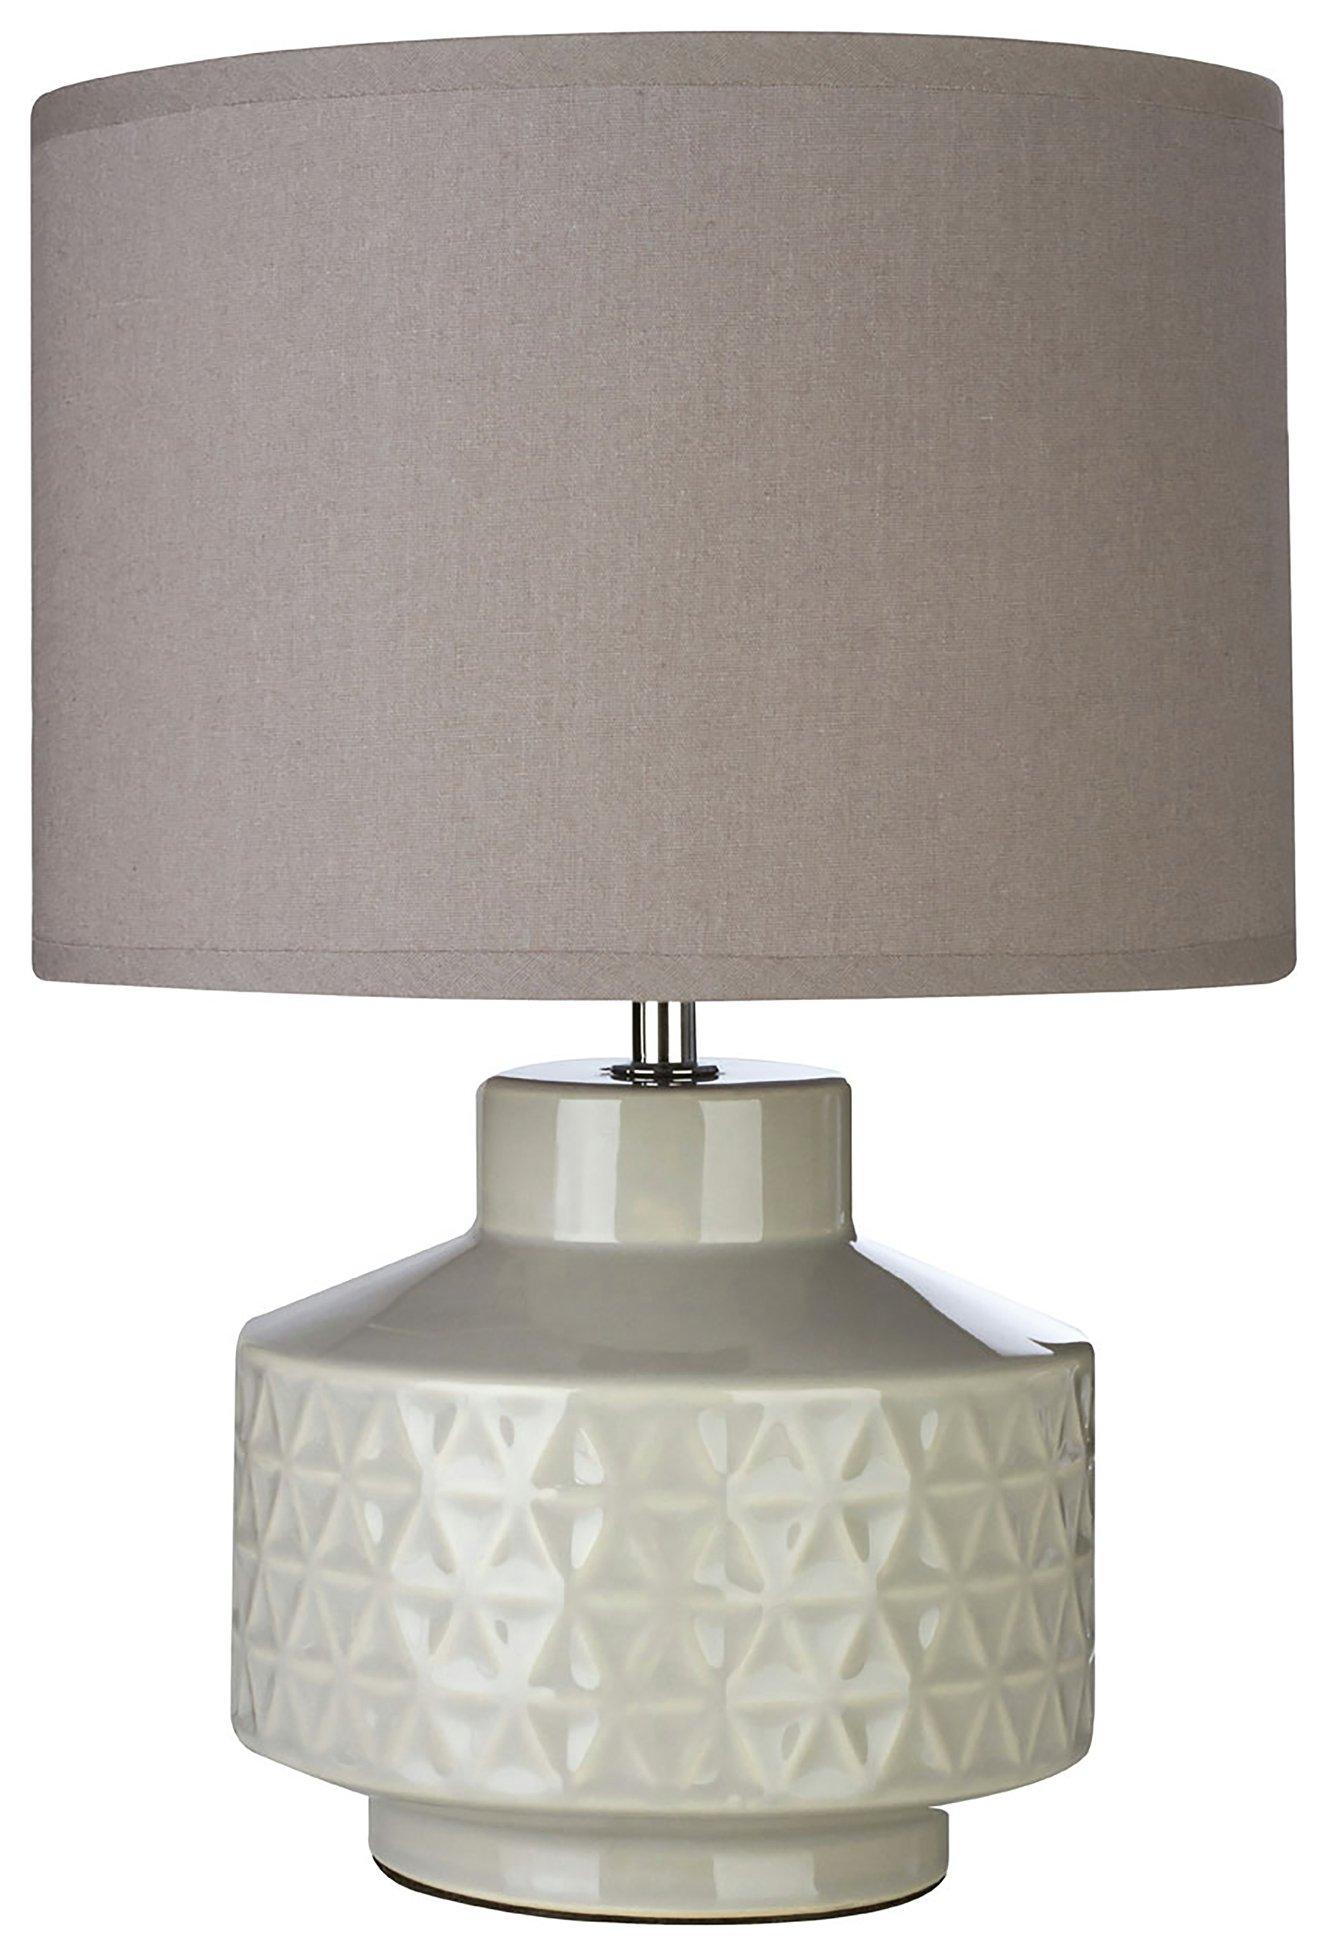 Waverly Ceramic Table Lamp - Grey